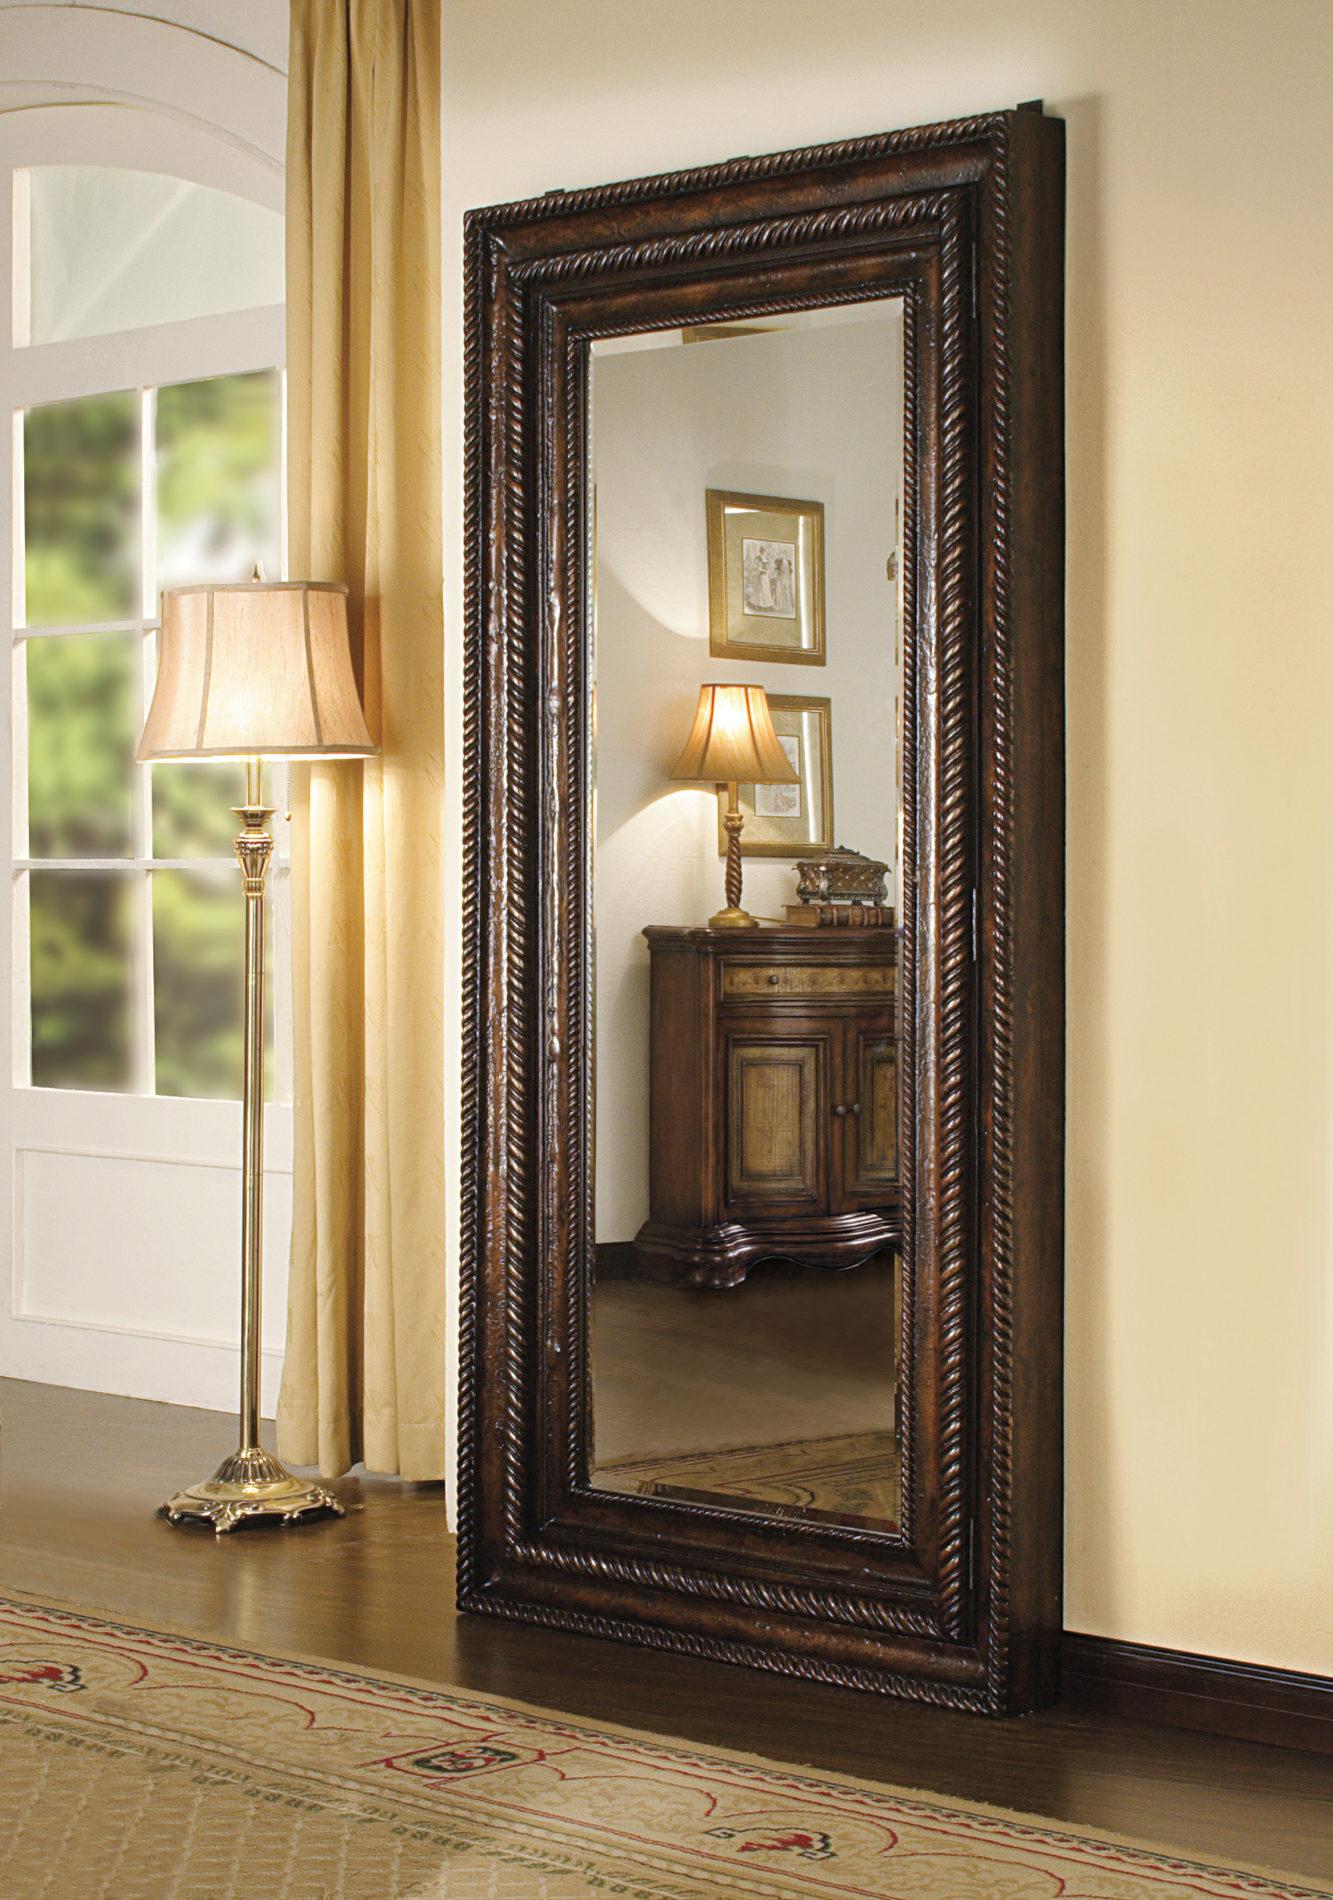 Charmant Floor Mirror W/Hidden Jewelry Storage